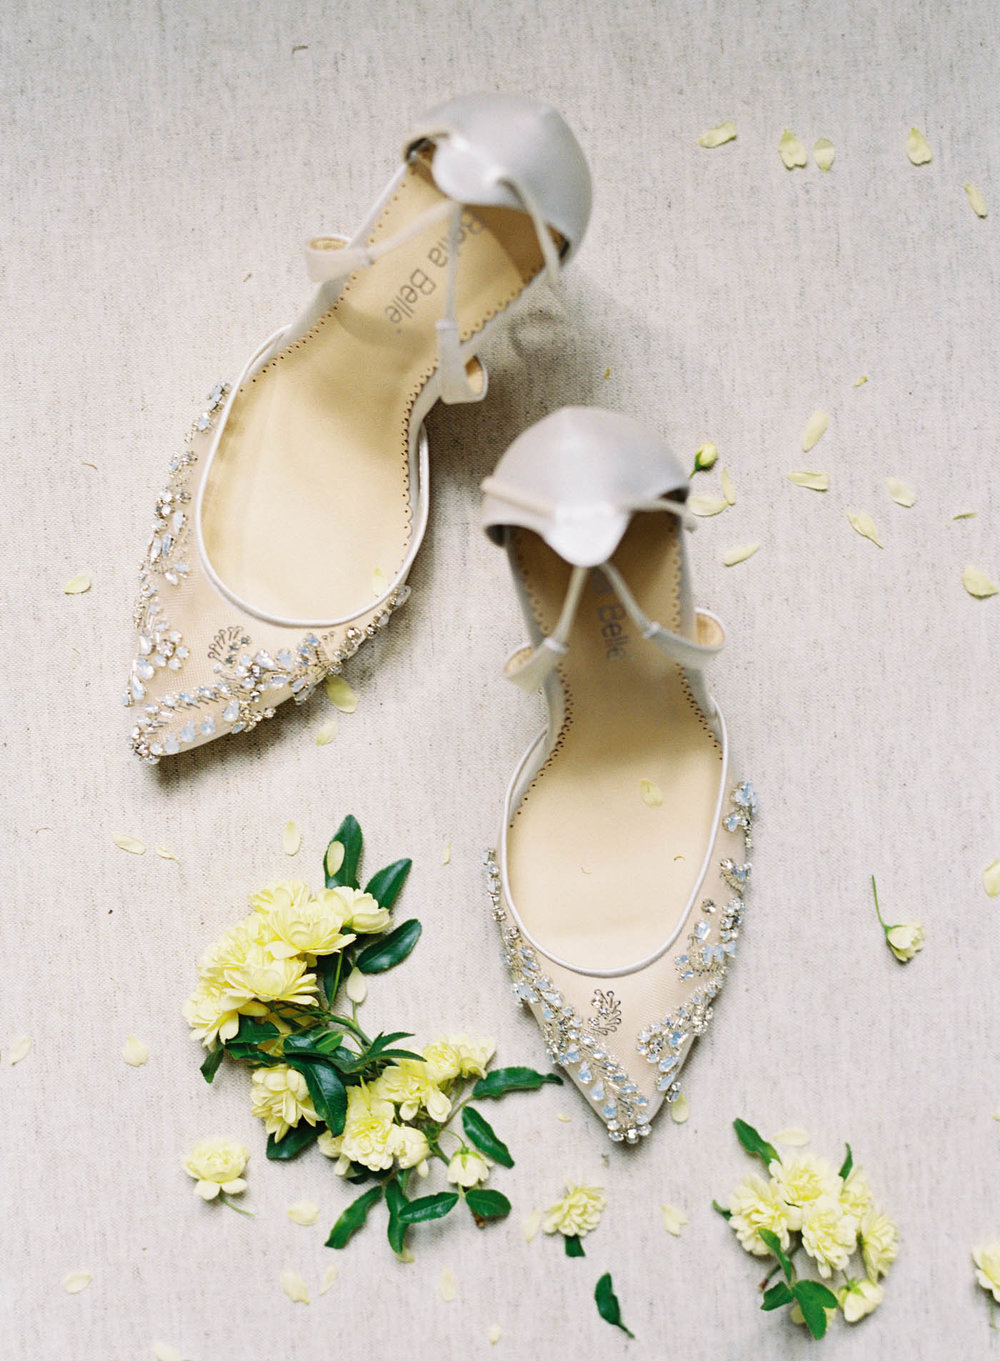 Villa_Cetinale_Wedding-8-Jen_Huang-ElanJacob-170-Jen_Huang-007301-R1-016.jpg